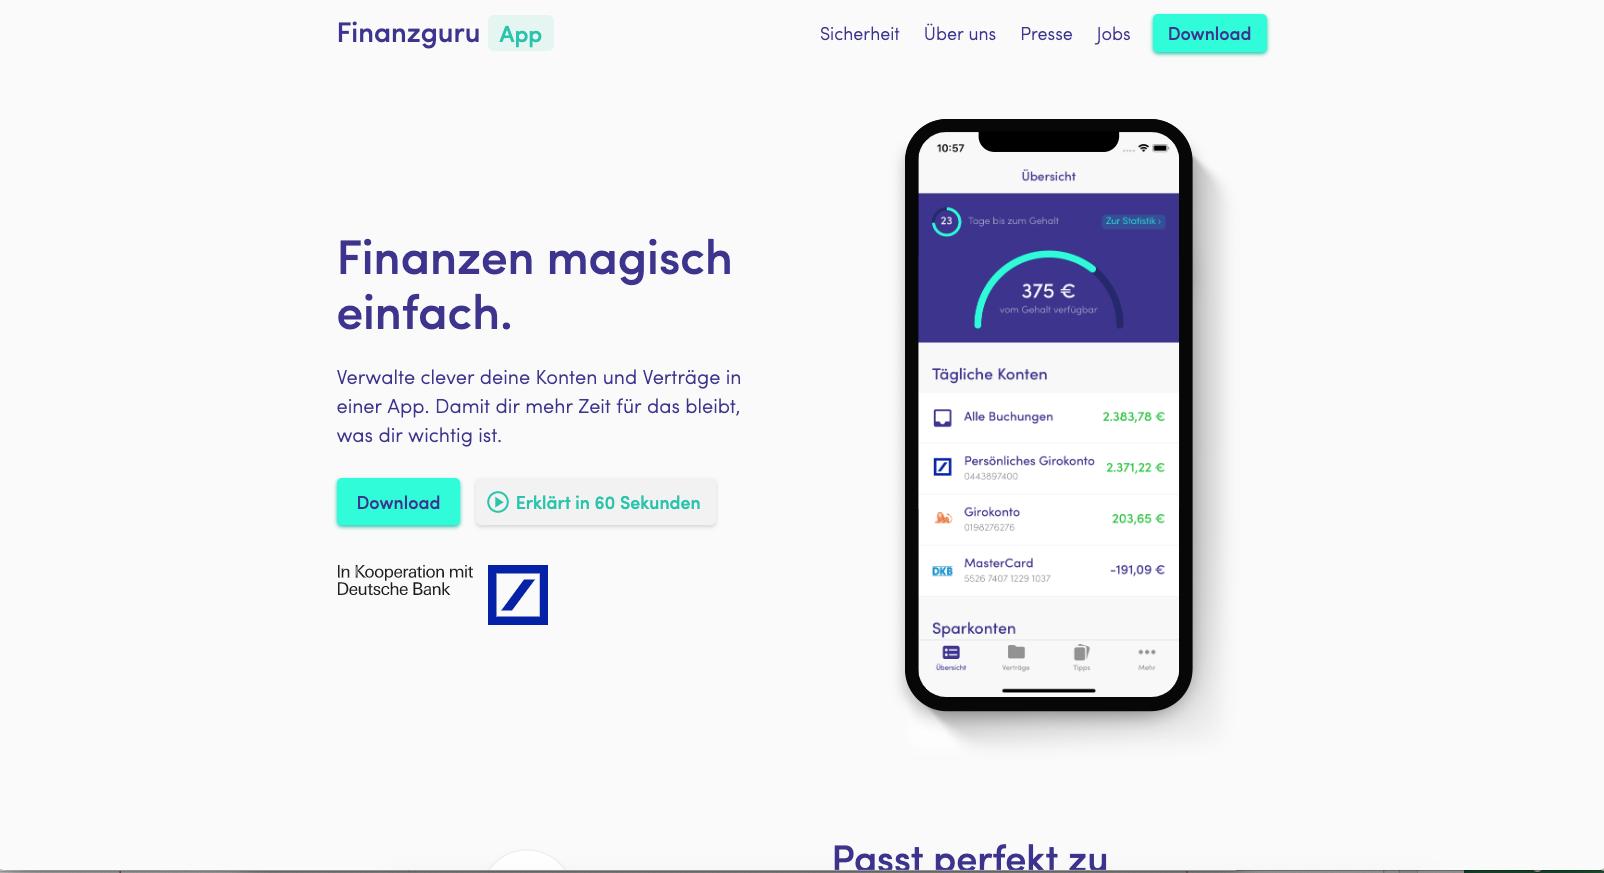 6-besten-finanz-apps-1.png